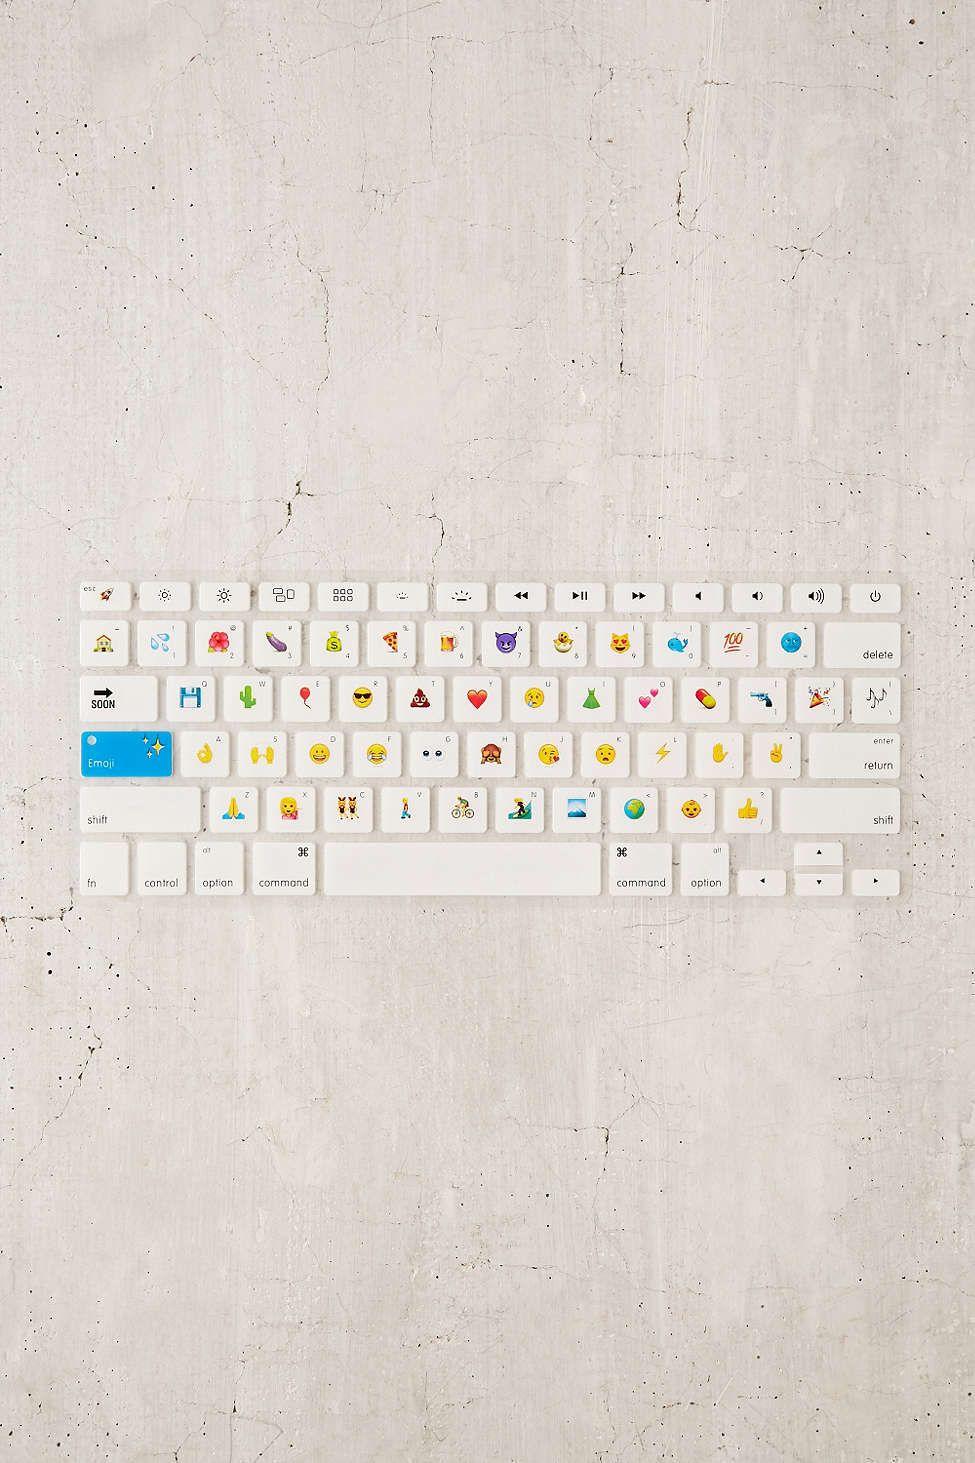 Disk Cactus Emoji Keyboard Cover Software Keyboard Cover Emoji Keyboard Cute Desk Accessories